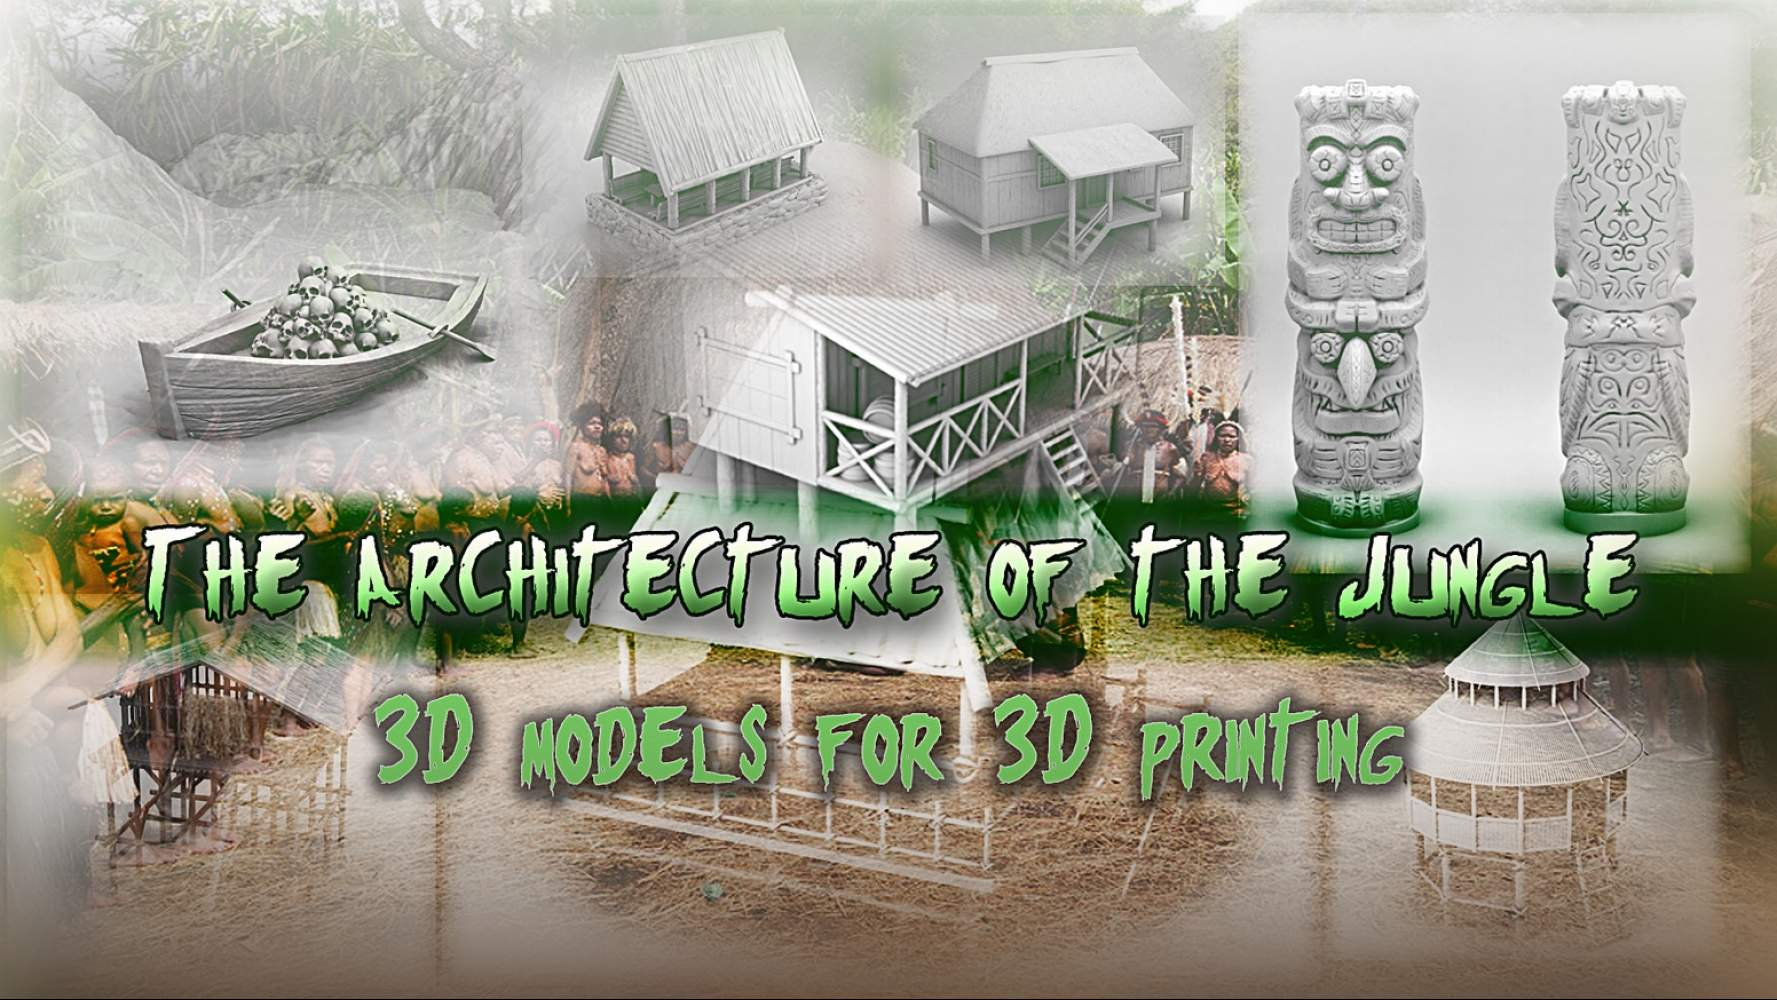 The architecture of the Jungle